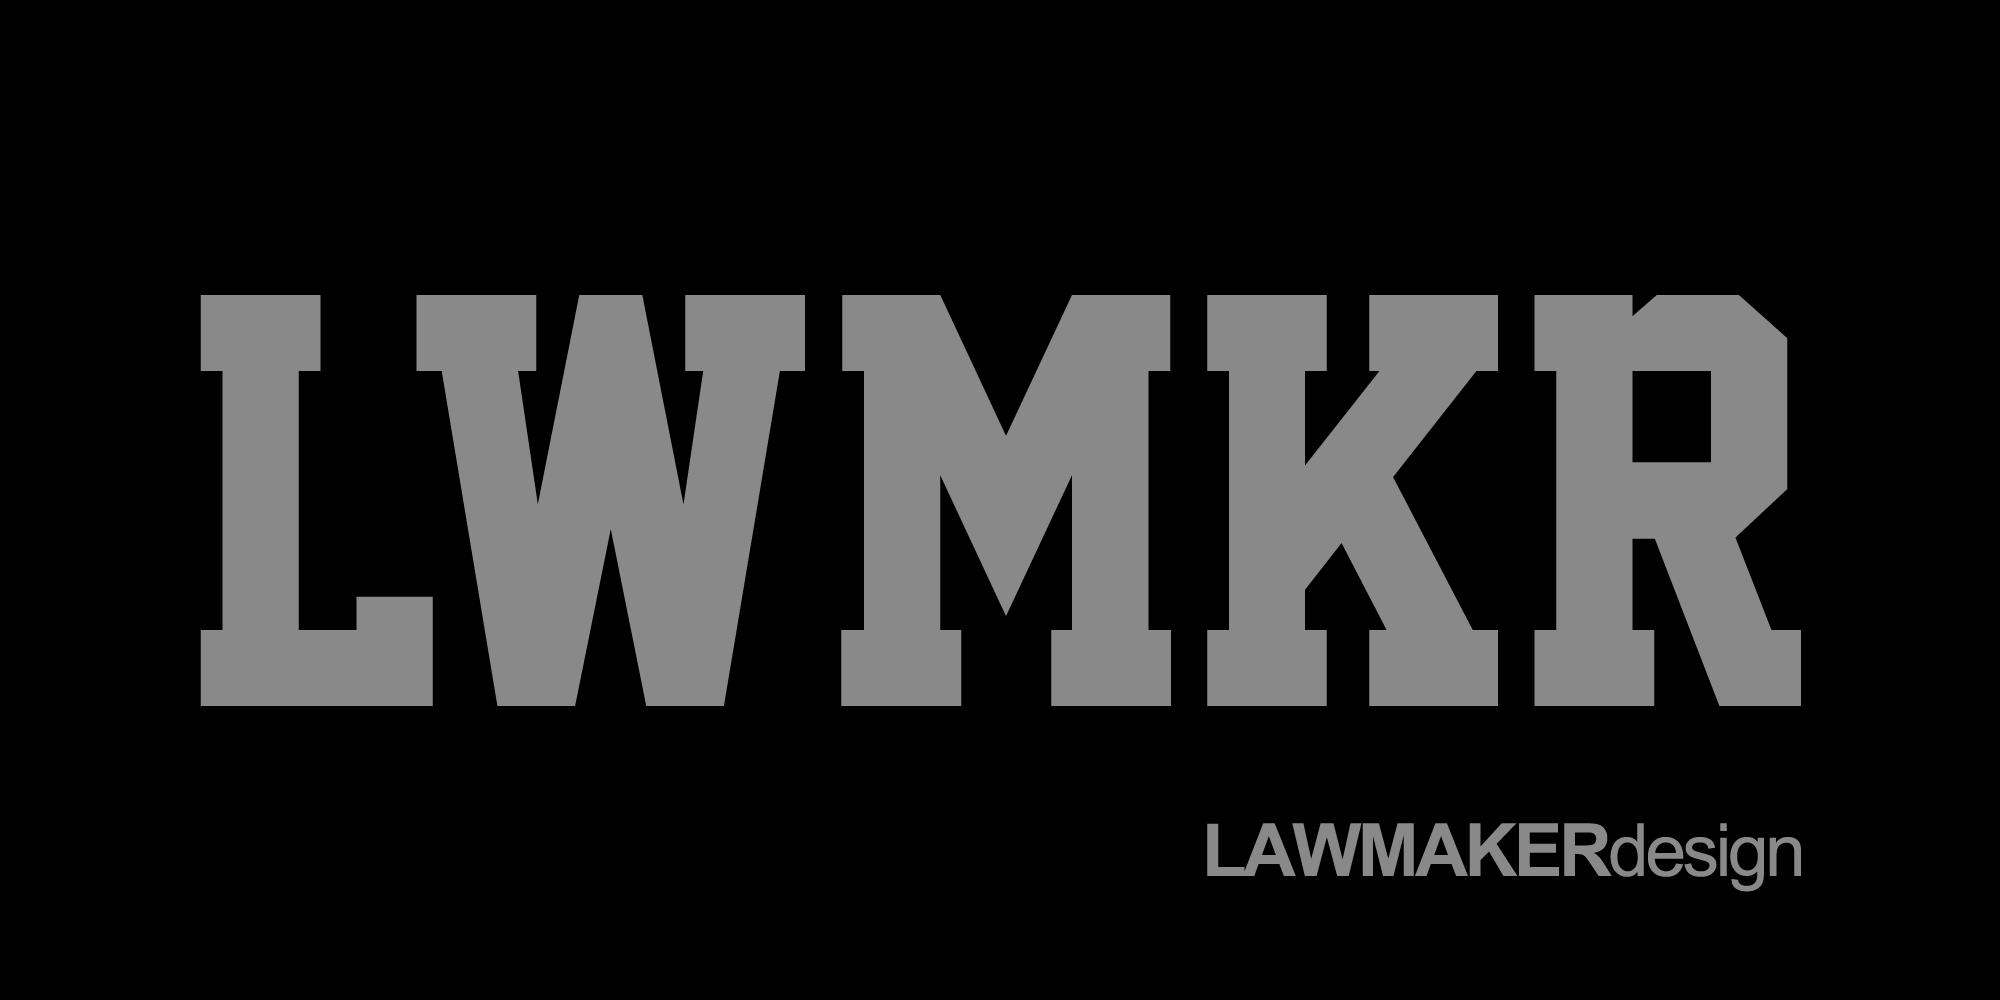 LAWMAKER design